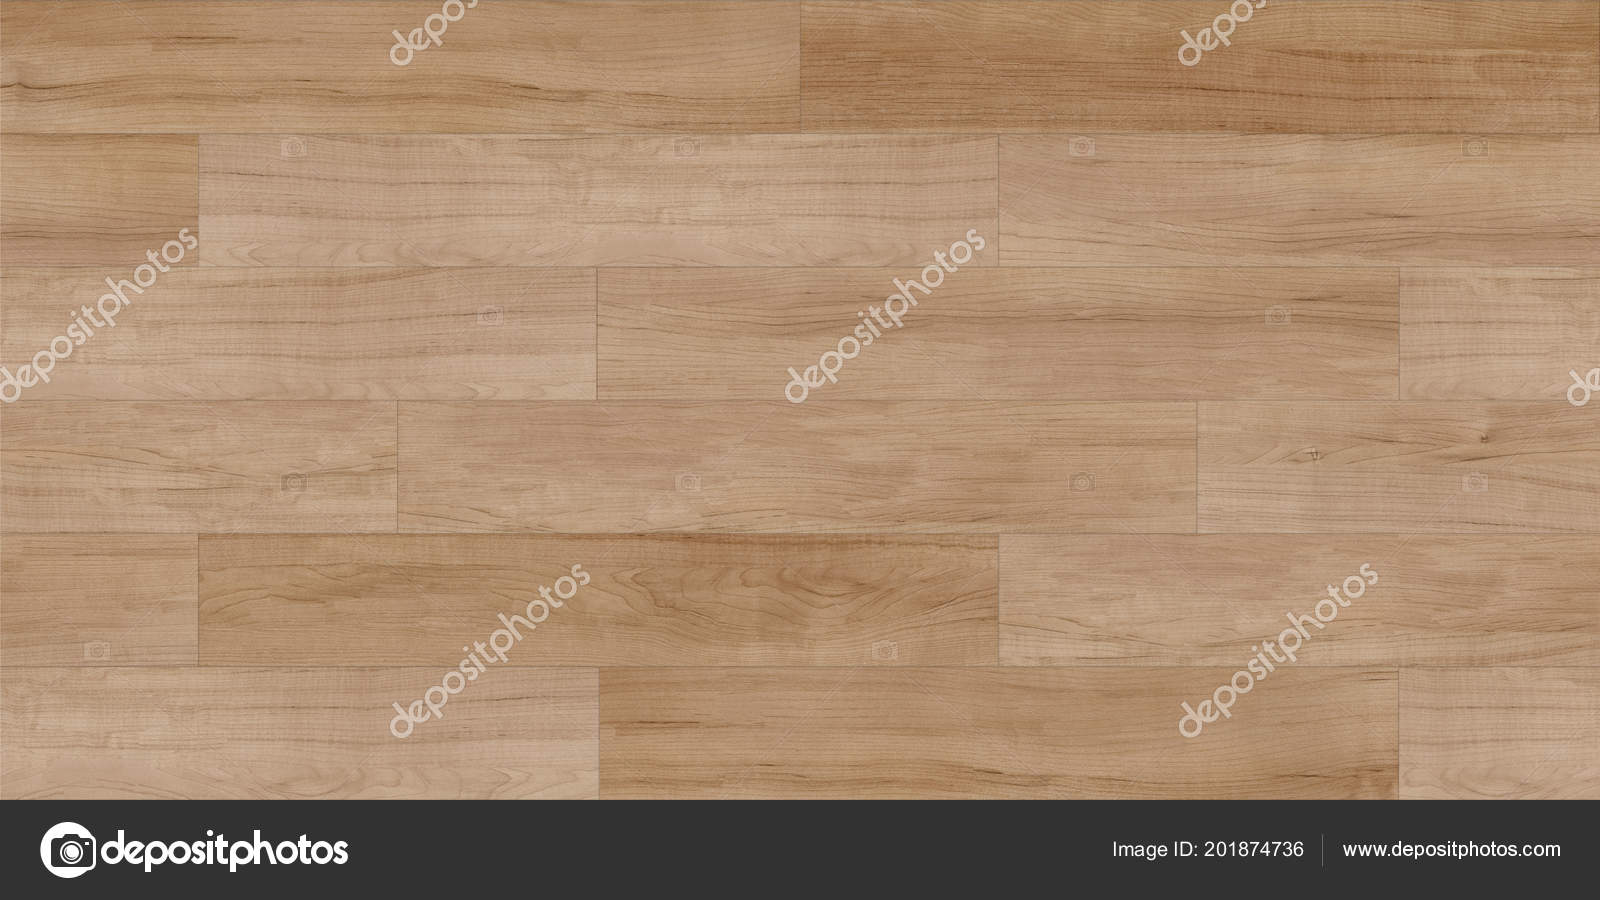 Laminate Flooring Seamless Texture Map Diffuse Fotos De Stock